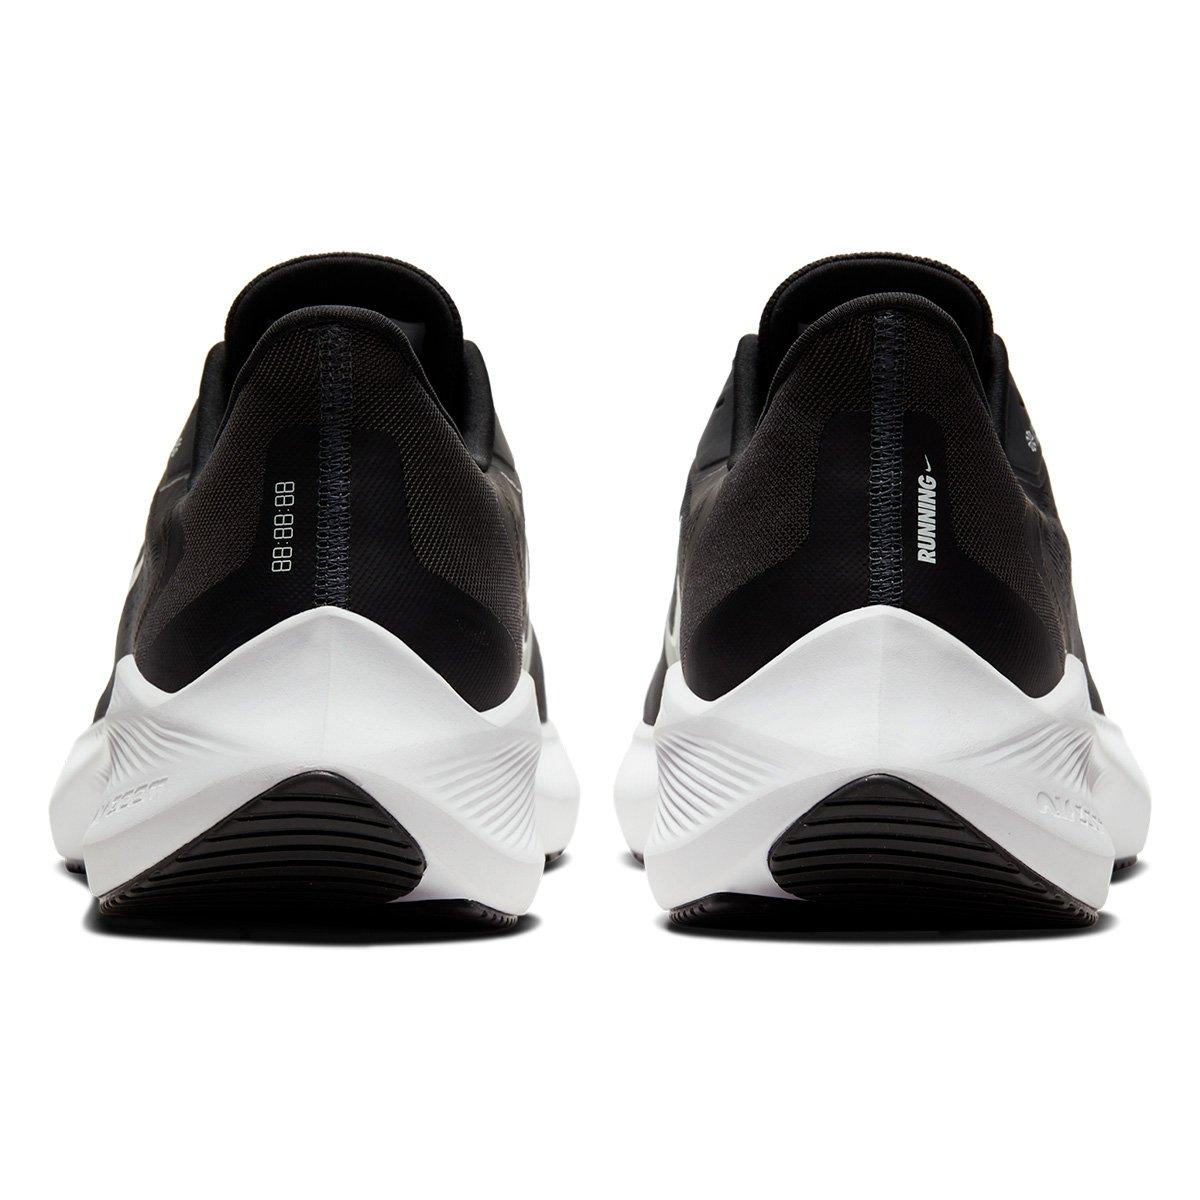 Tênis Nike Air Zoom Winflo 7 Preto e Branco - Masculino